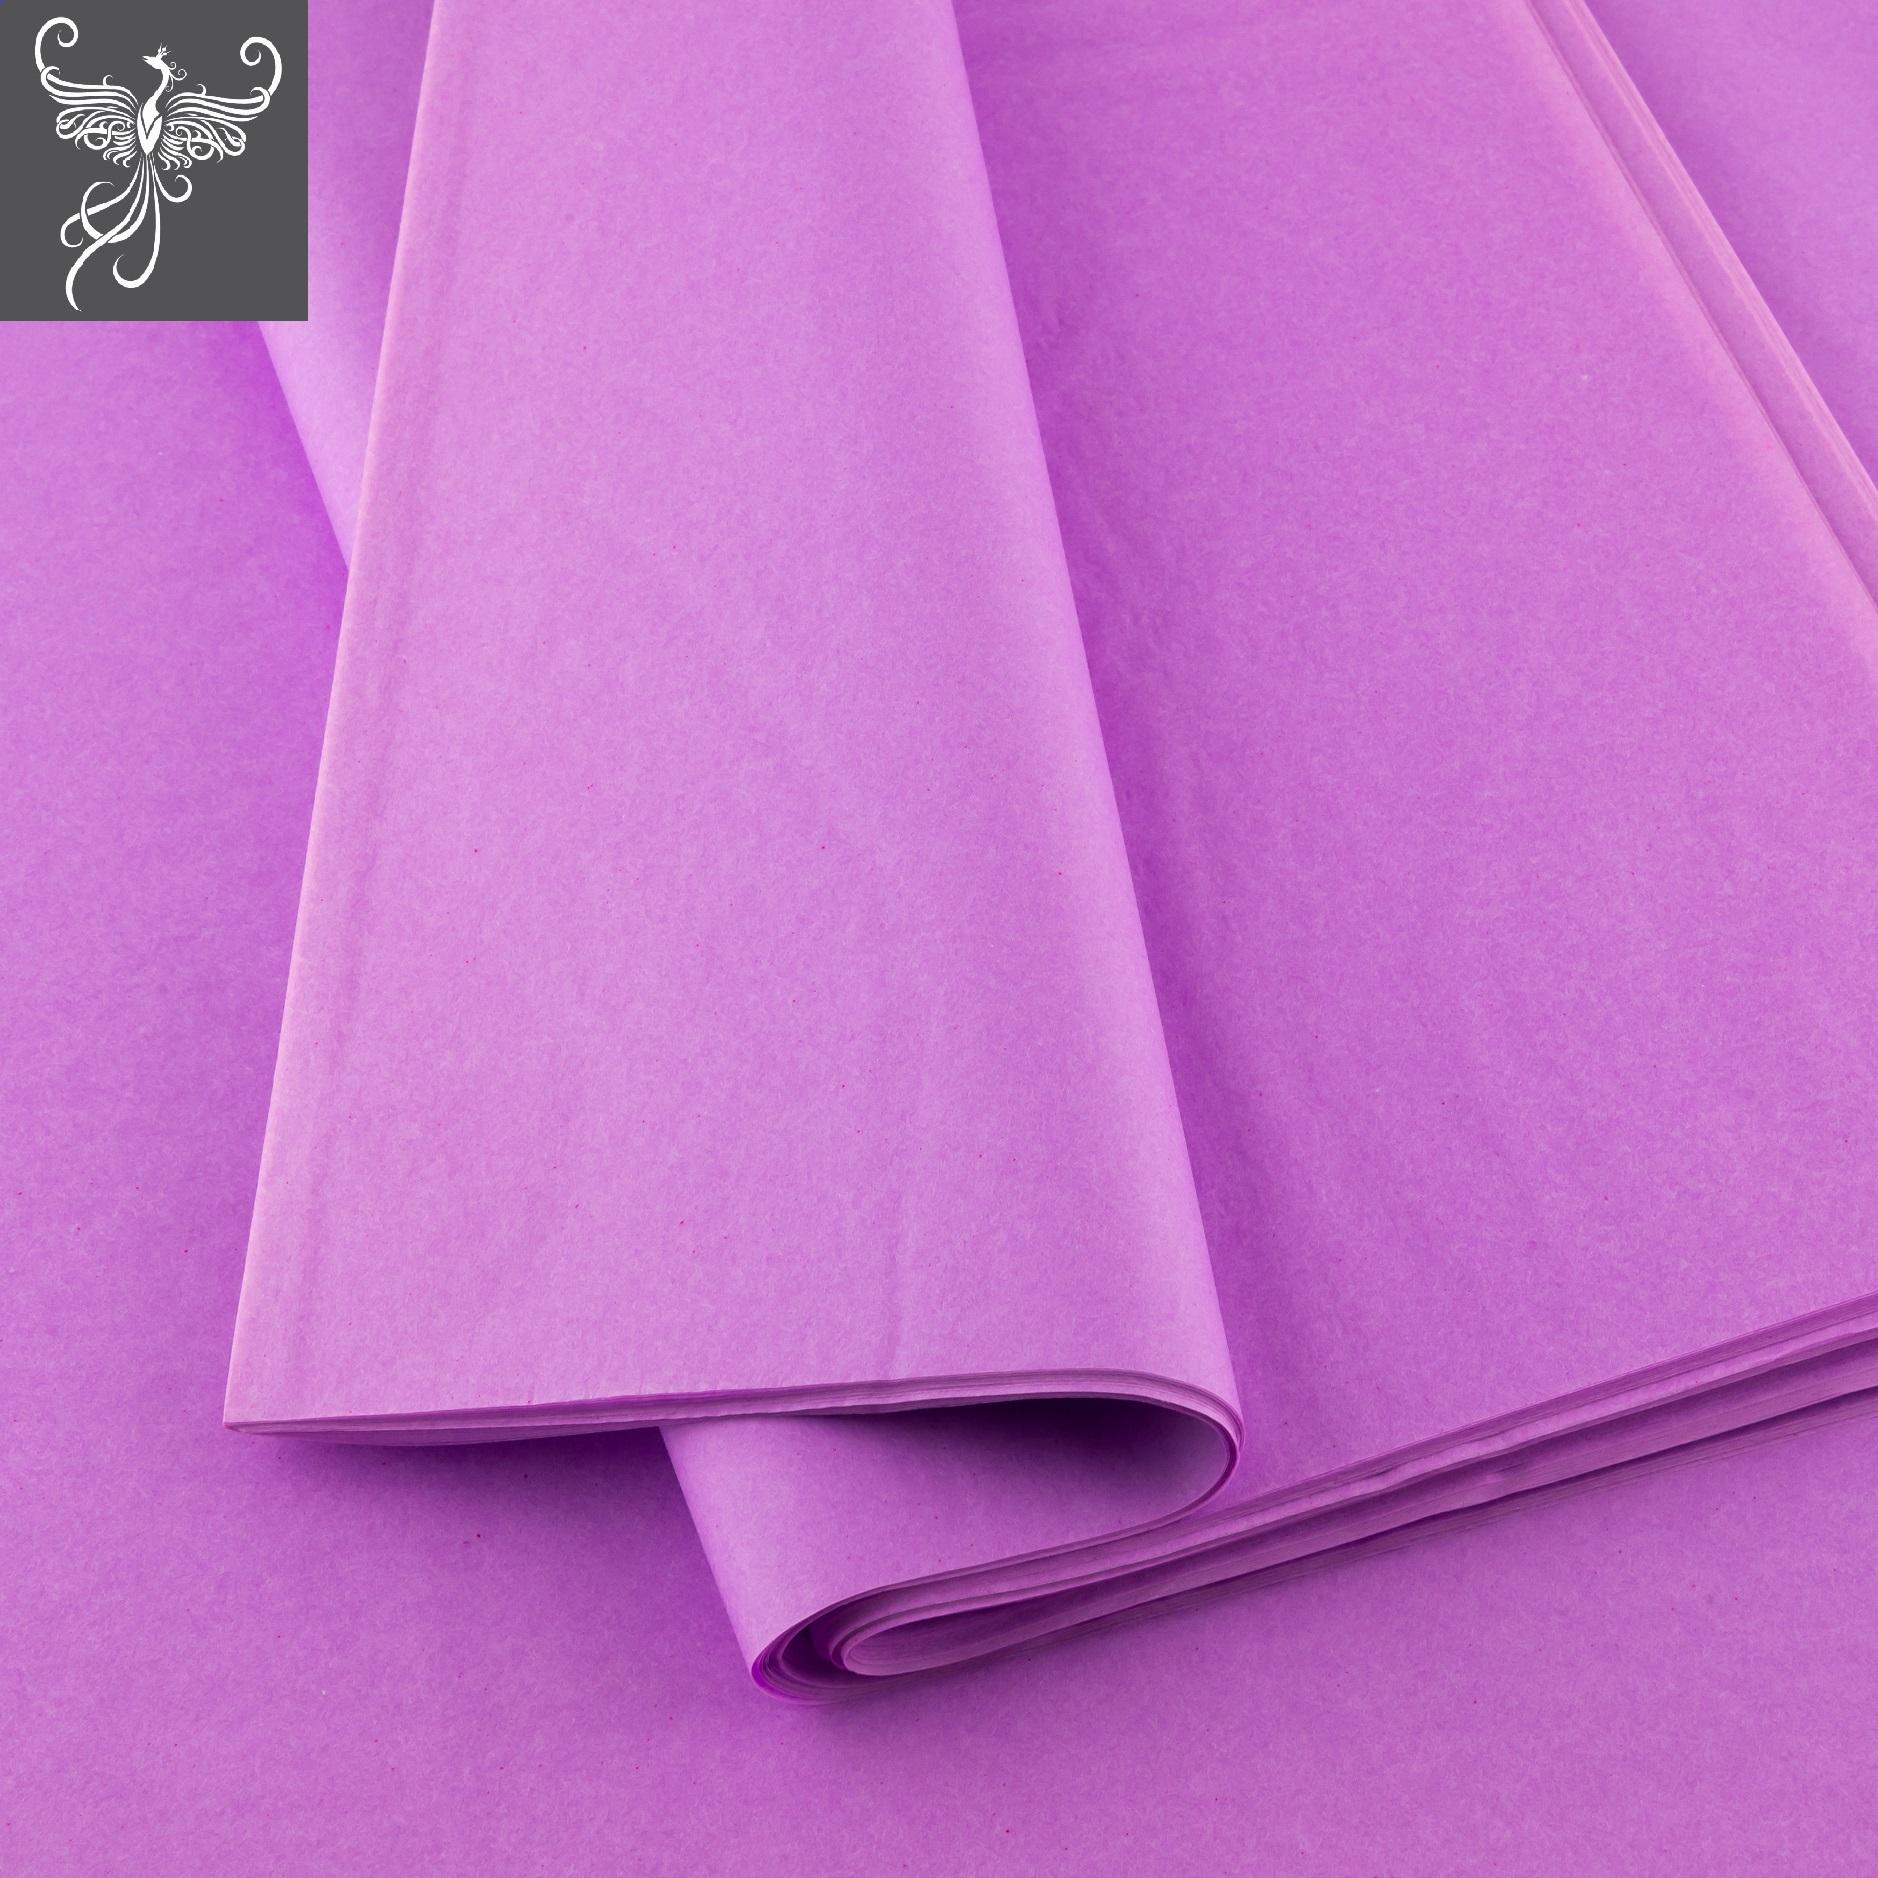 Plain tissue paper lilac